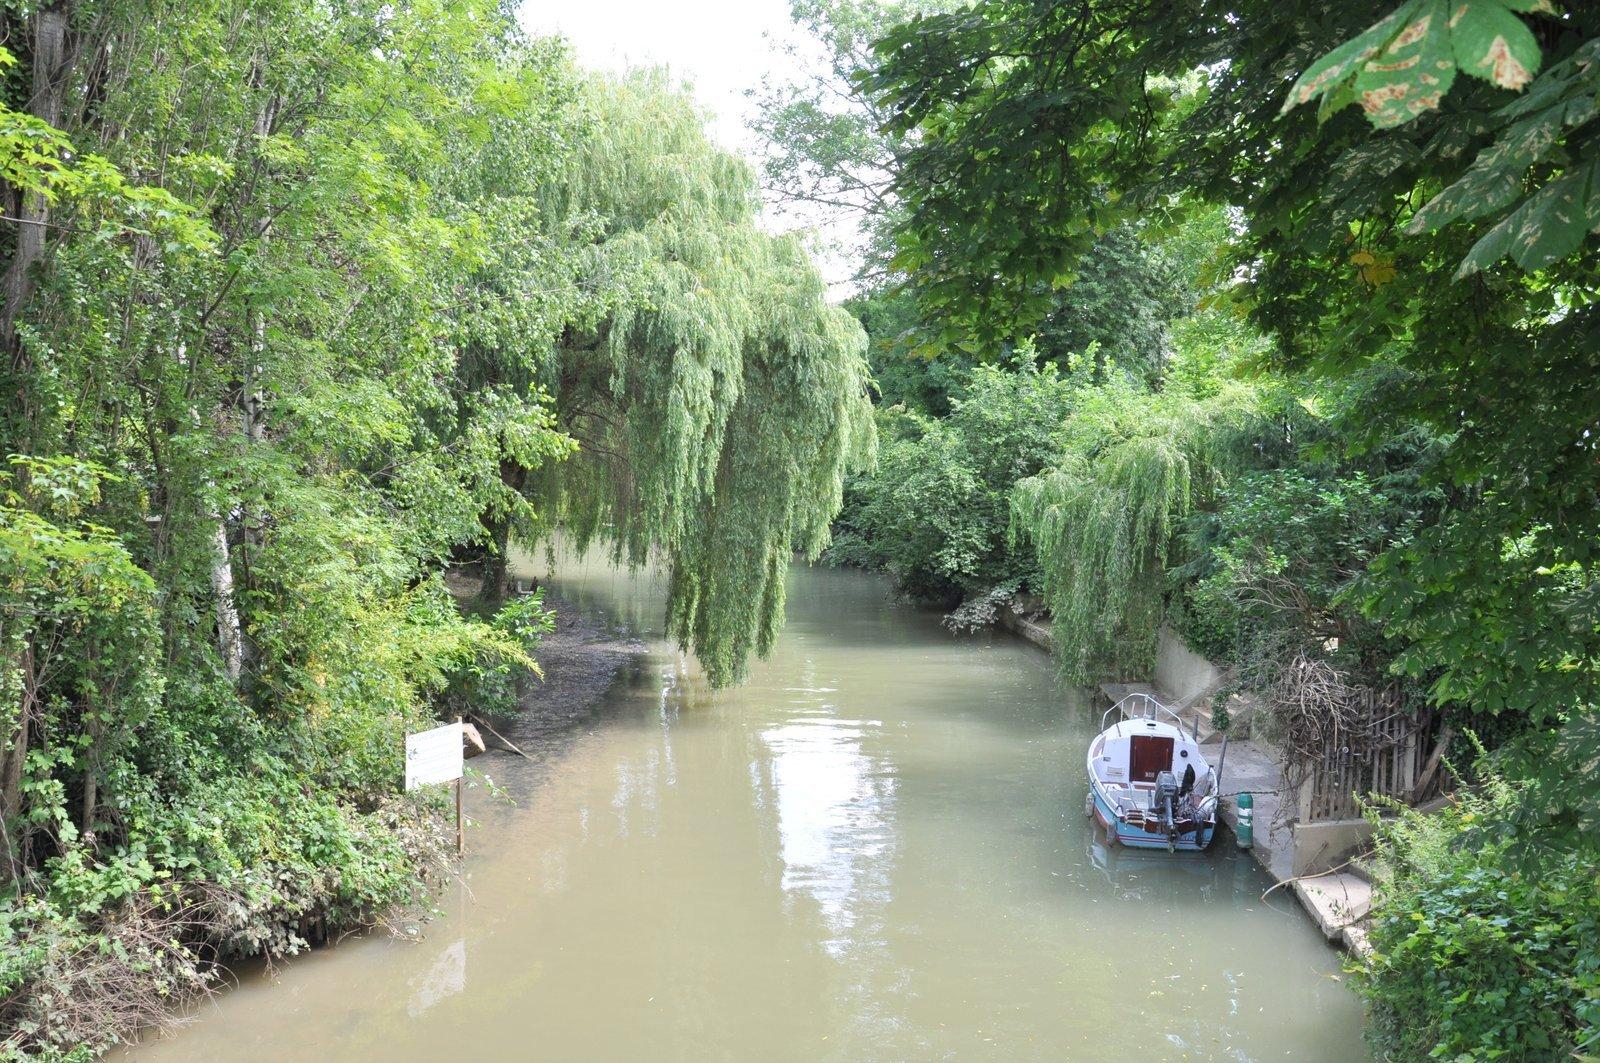 joinville-le-pont-canal-polangis